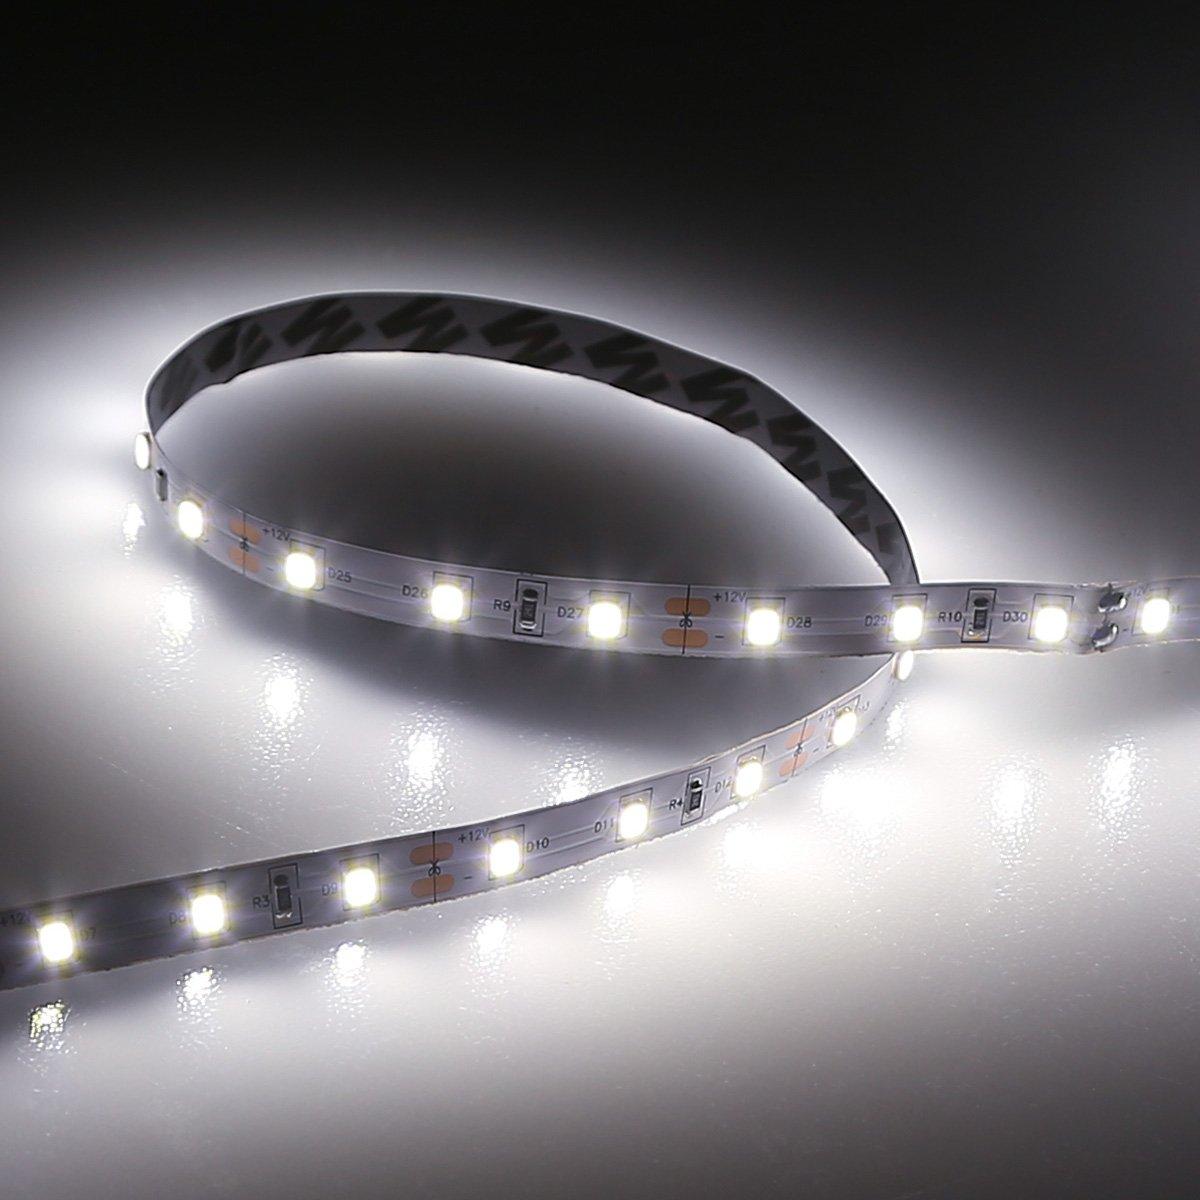 LE 16.4ft LED Flexible Light Strip, 300 Units